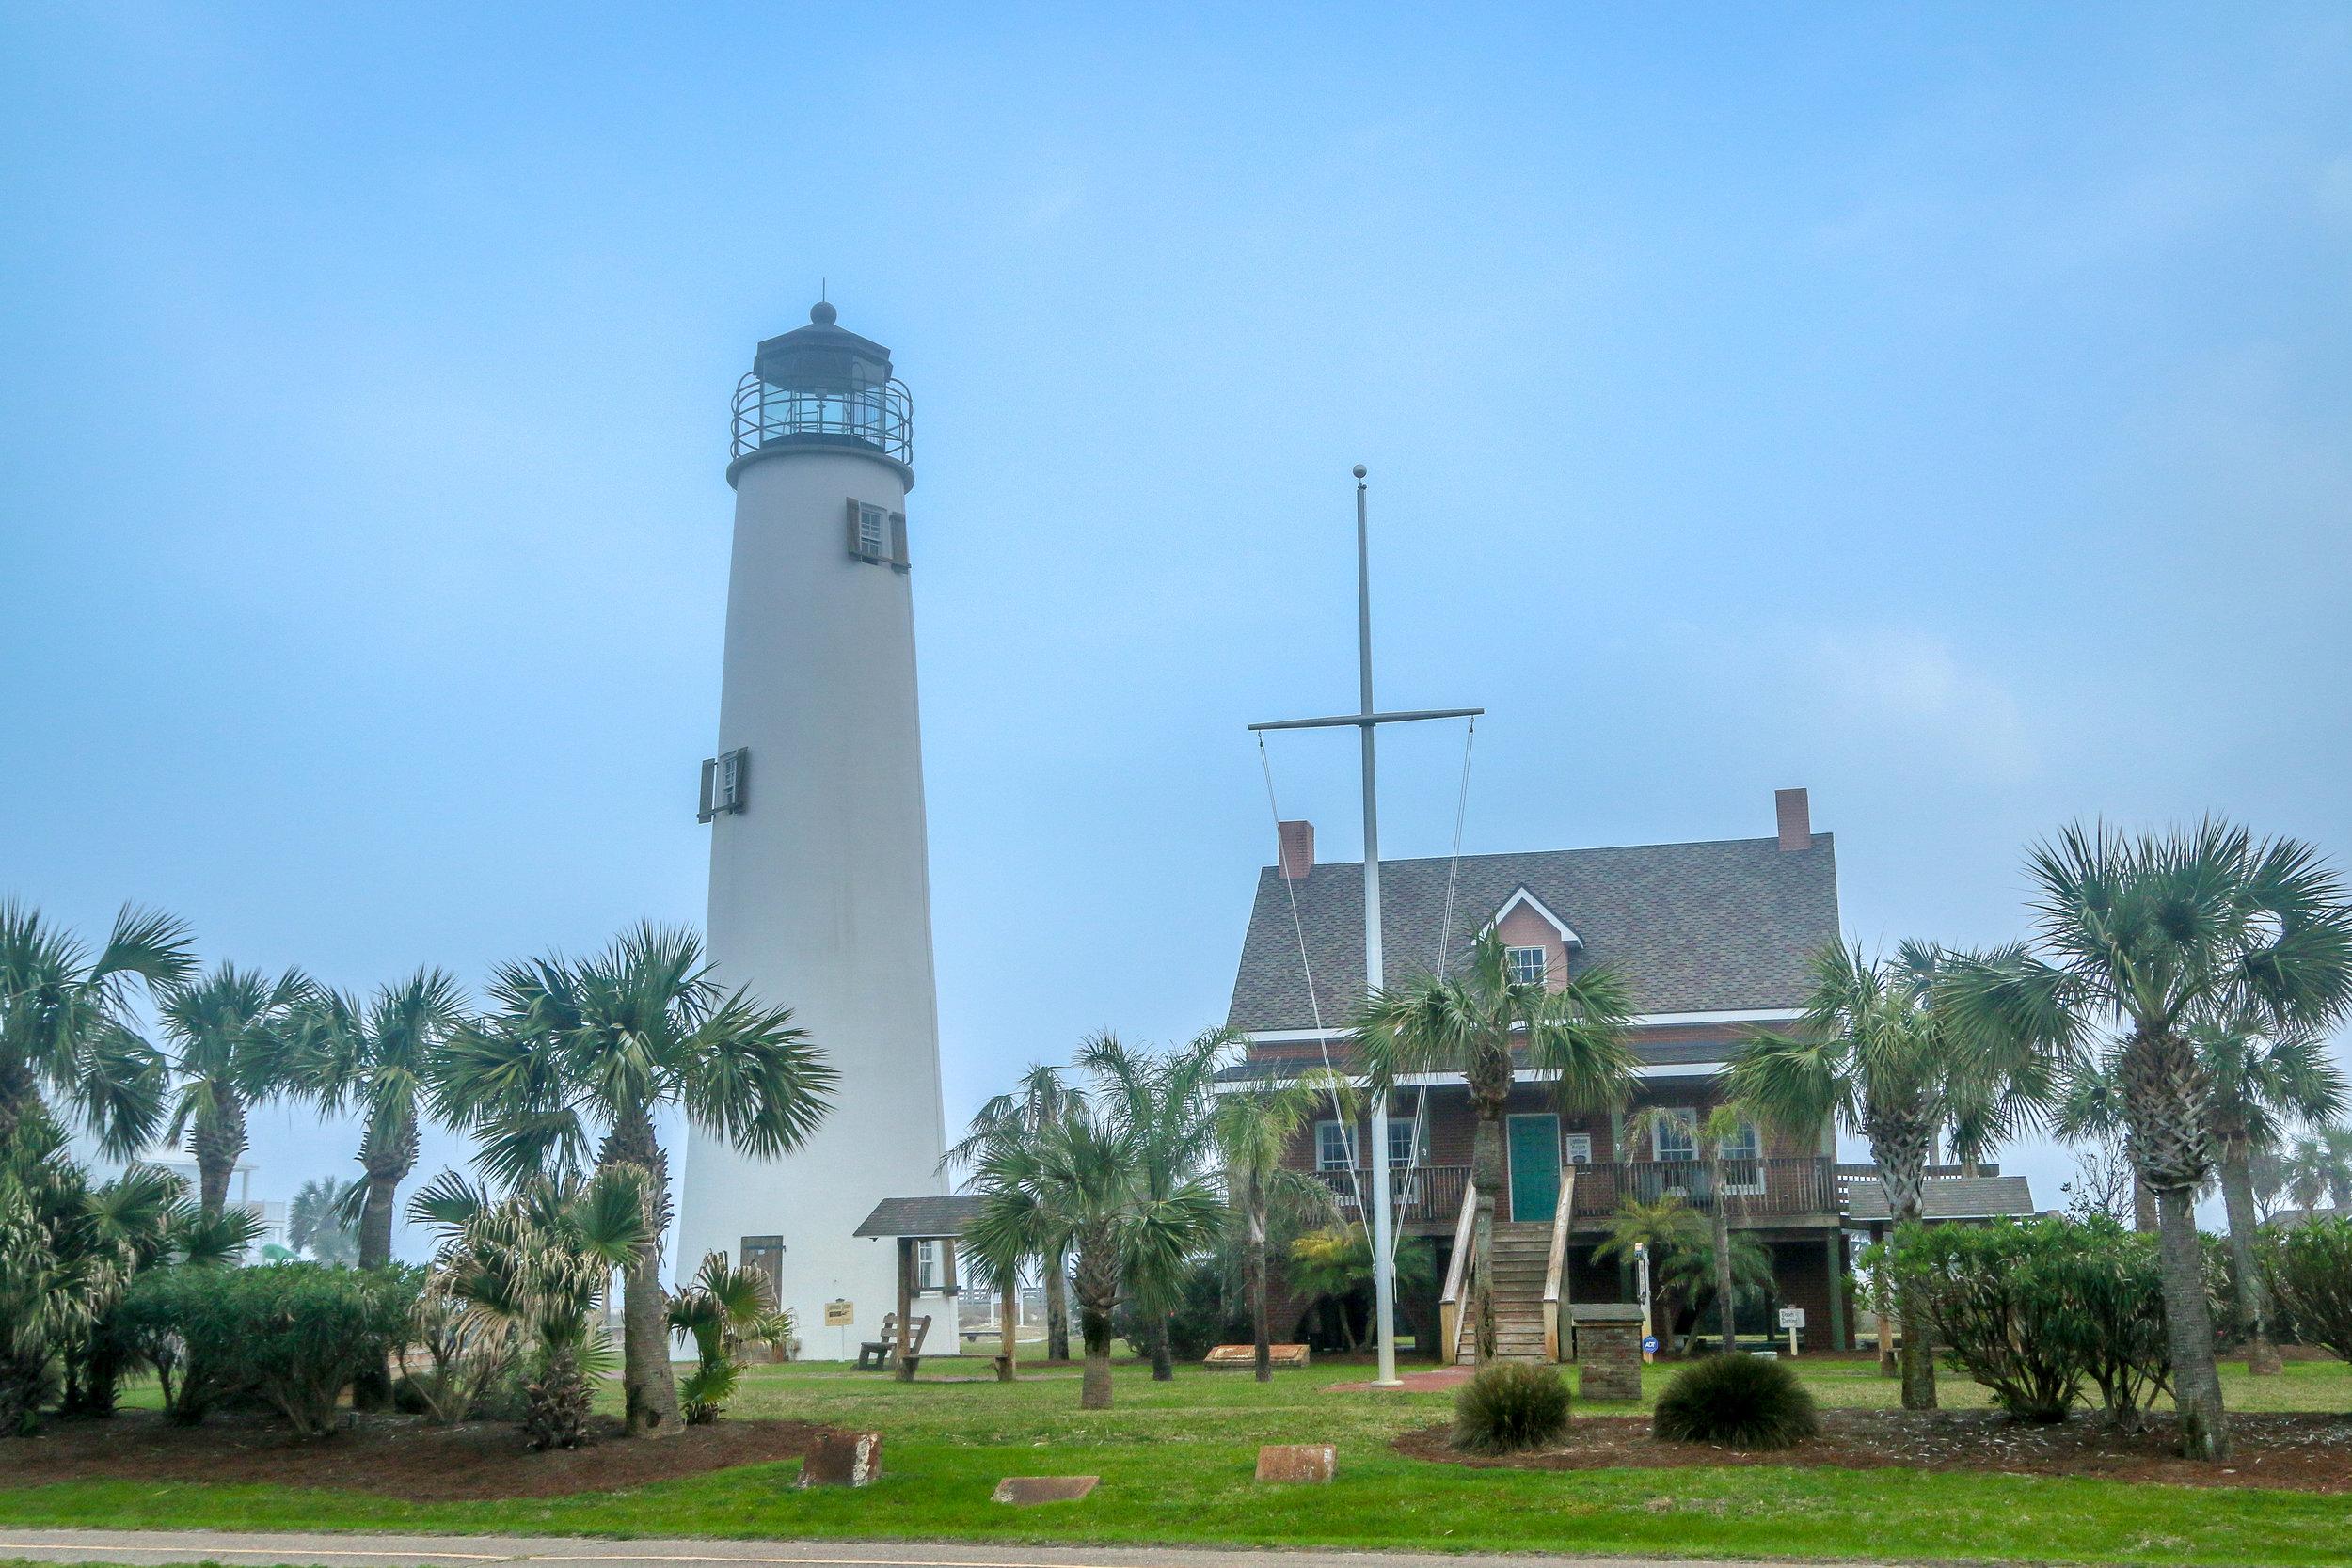 St. George's Island Light